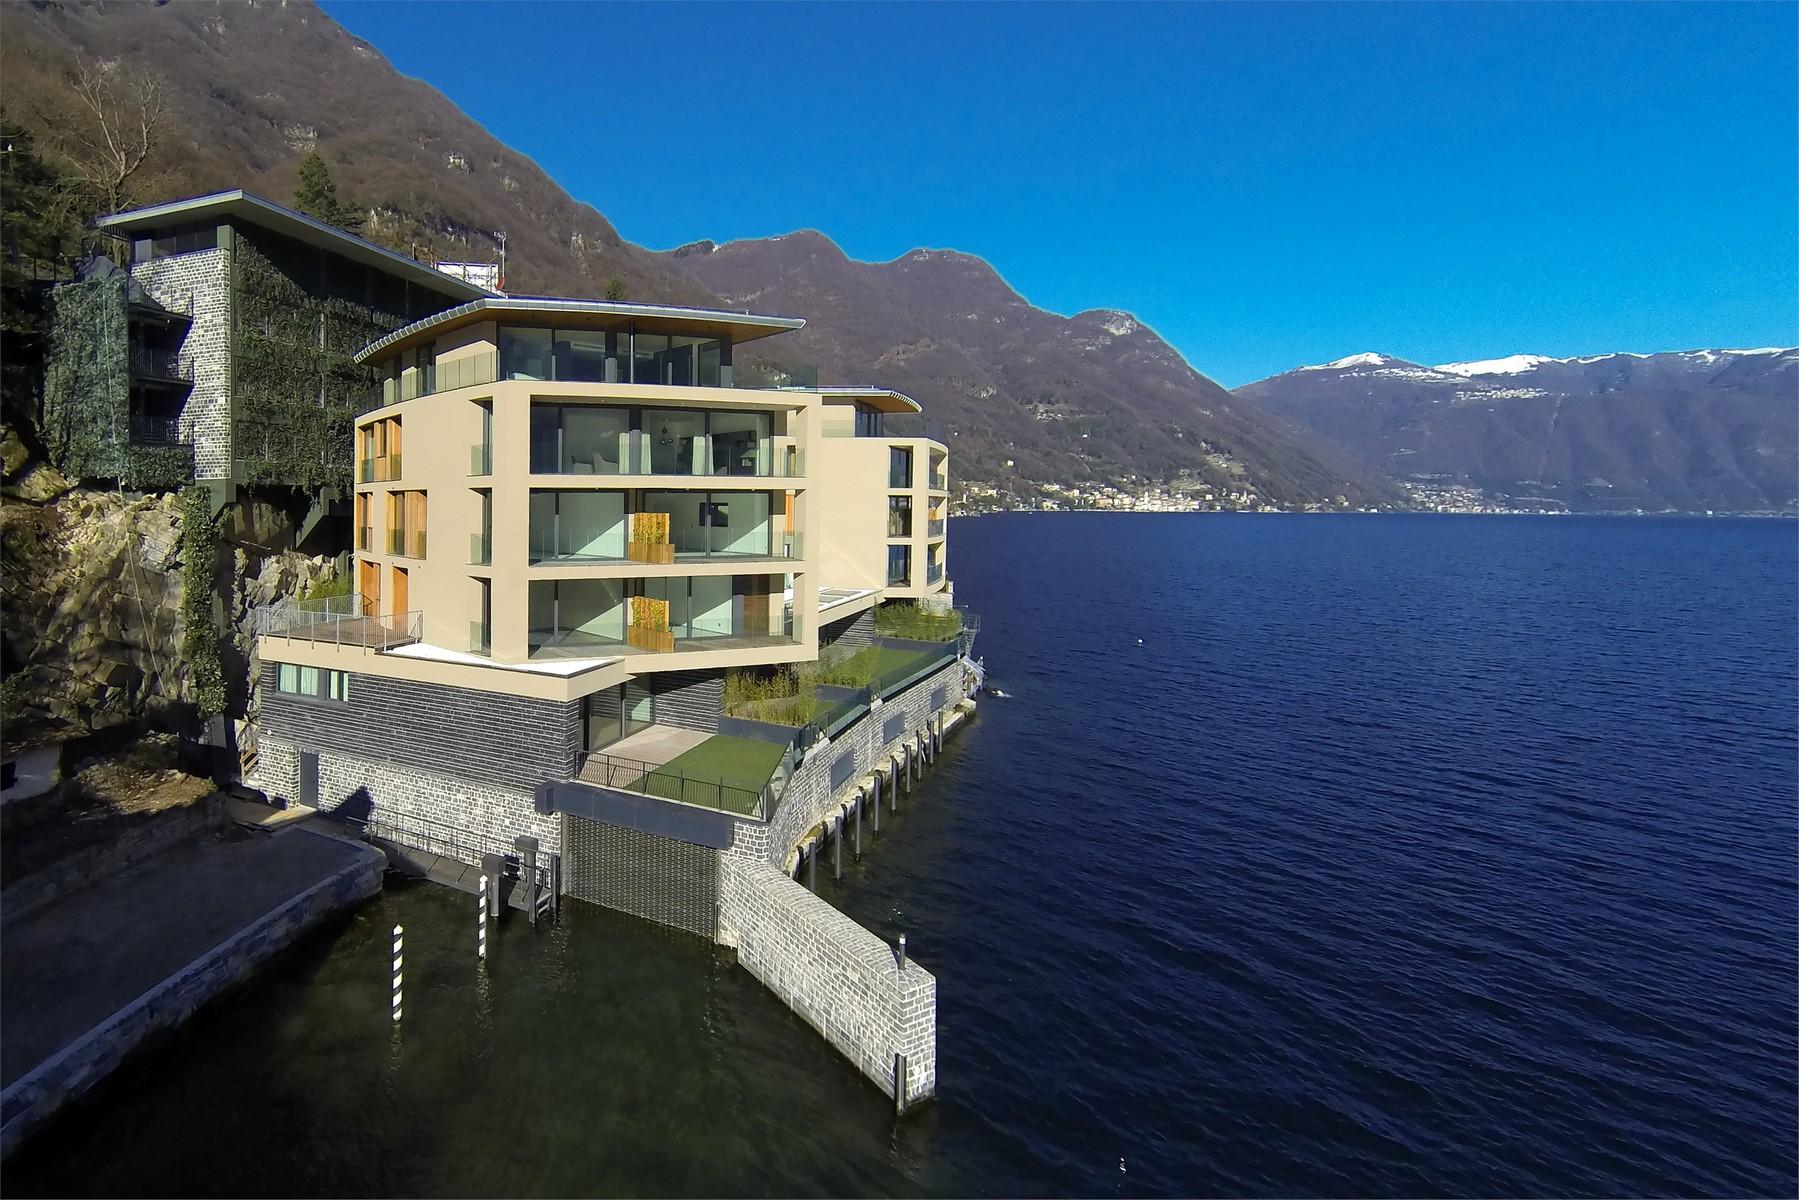 Apartment for Sale at Wonderful apartment in new building on Lake Como Via Nuova Regina Laglio, Como 22010 Italy